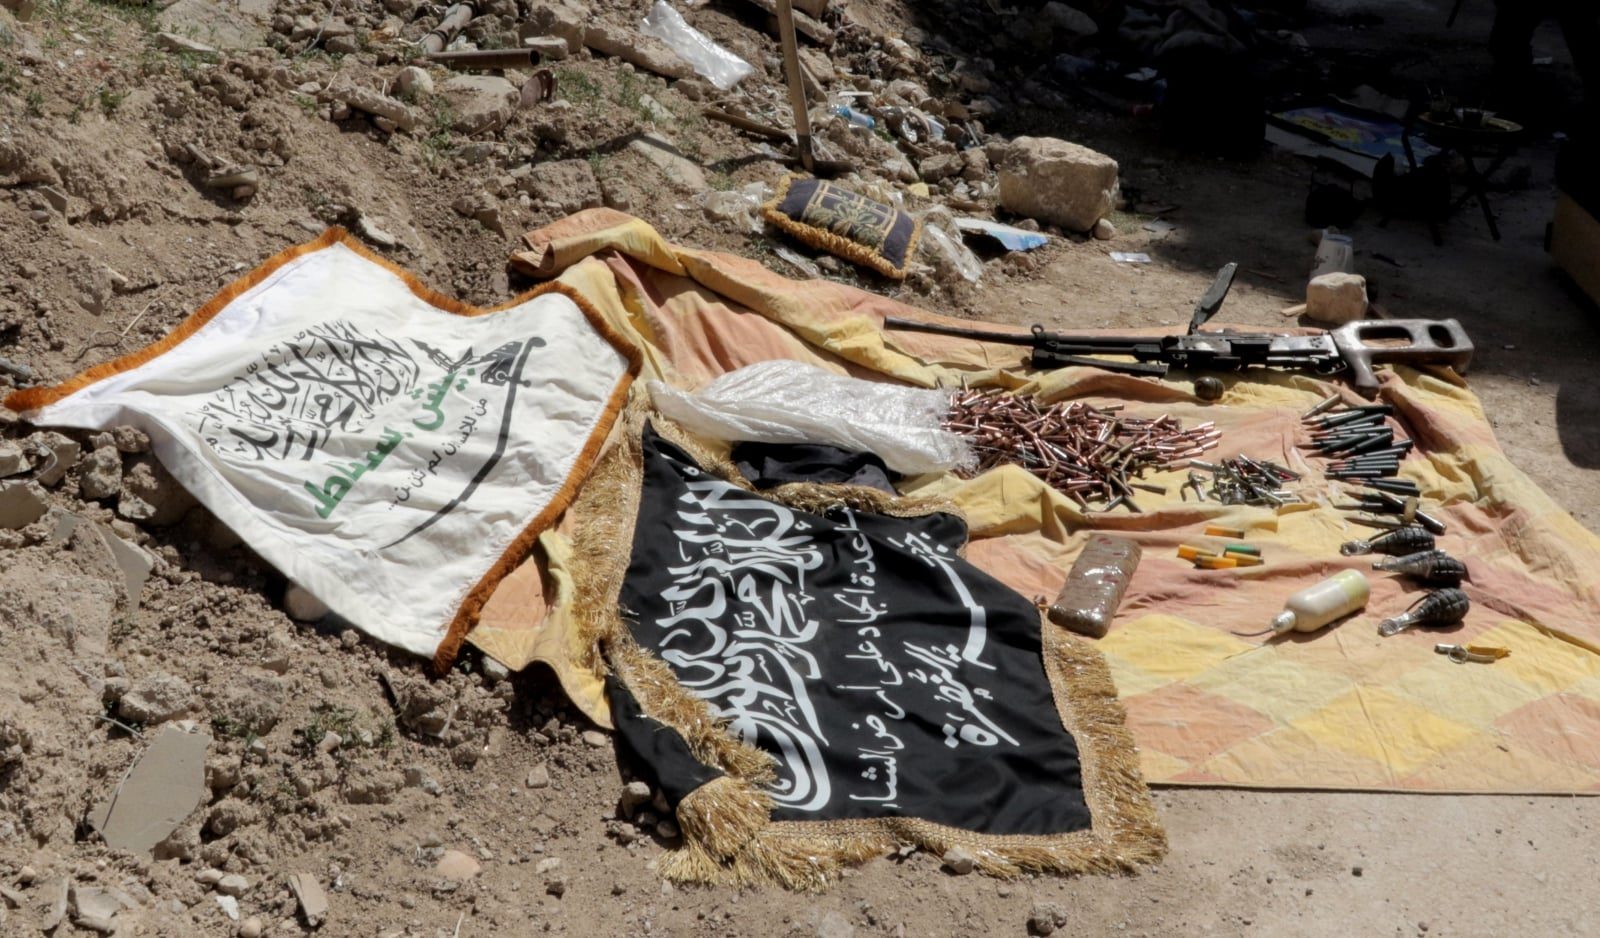 Konflikt w Syrii fot. EPA/YOUSSEF BADAWI